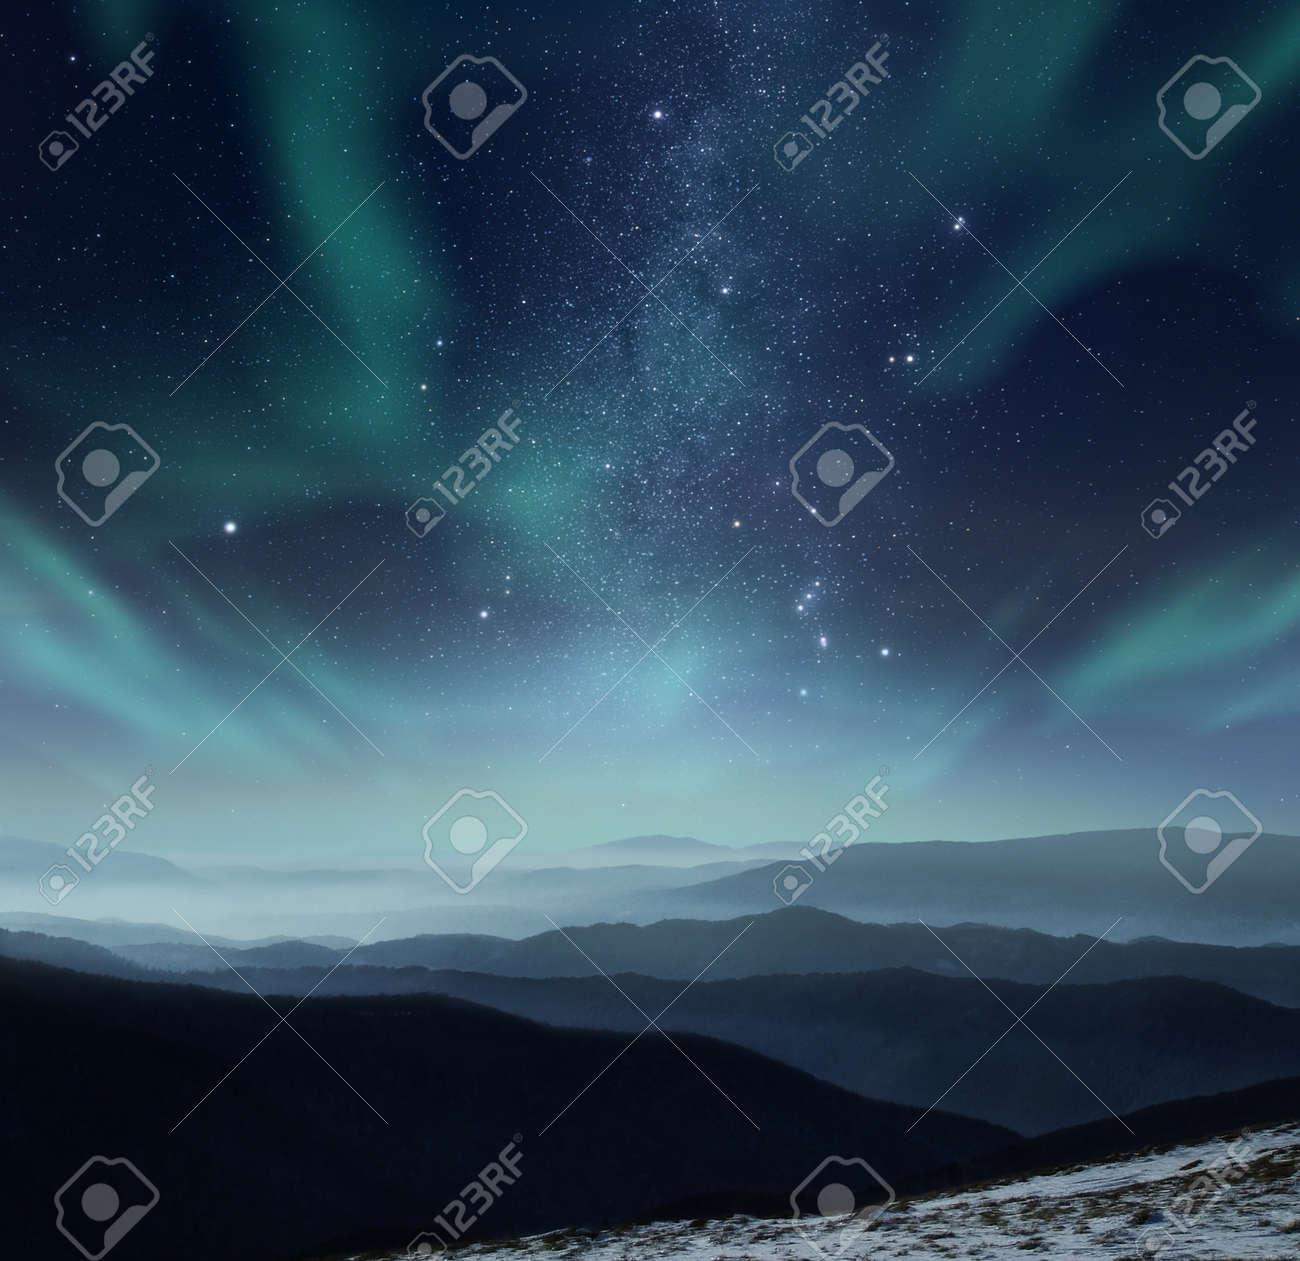 Starry night sky with aurora polaris over the mountains - 58768004